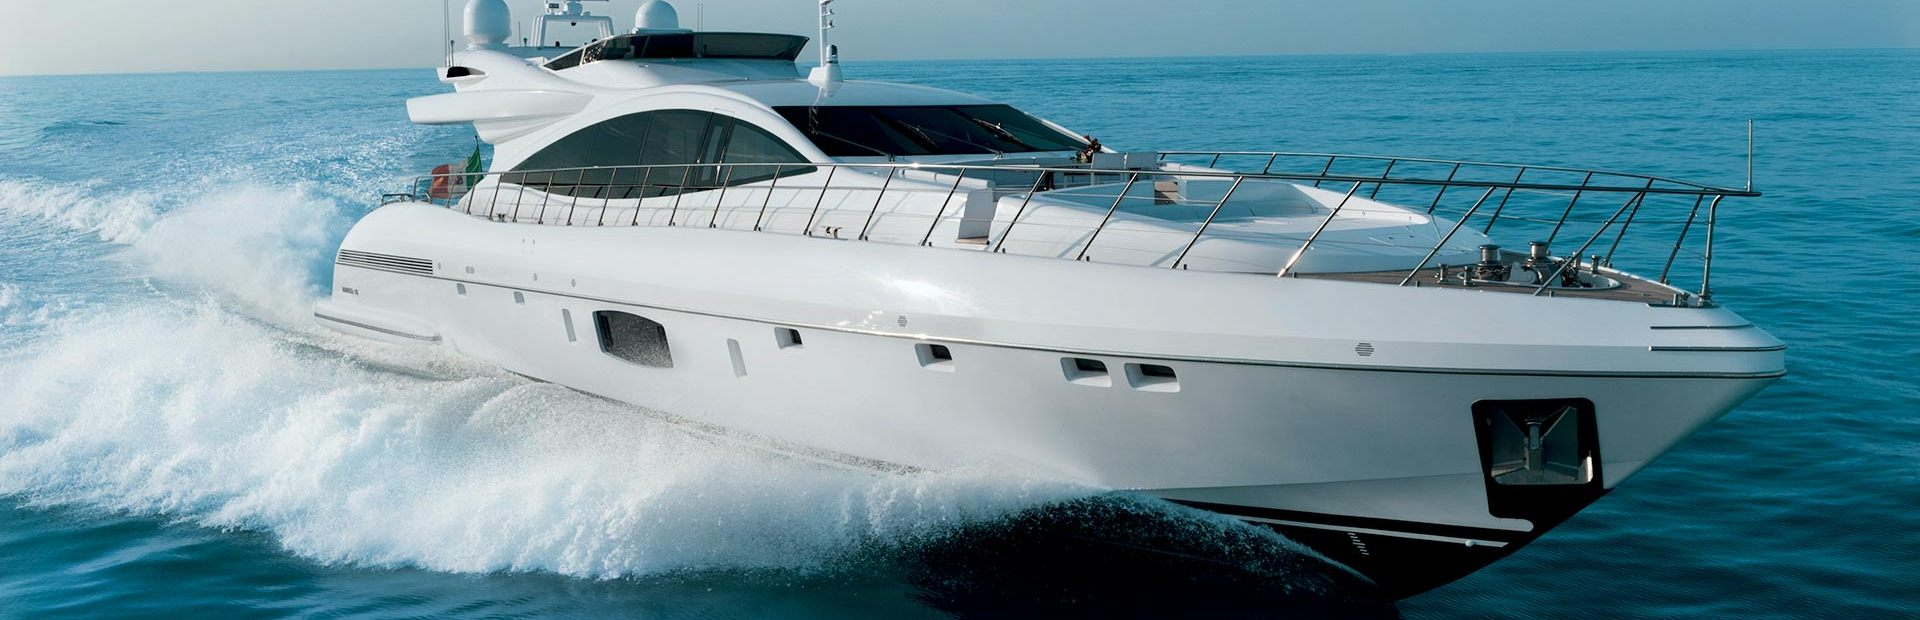 Mangusta 110 Yacht Charter